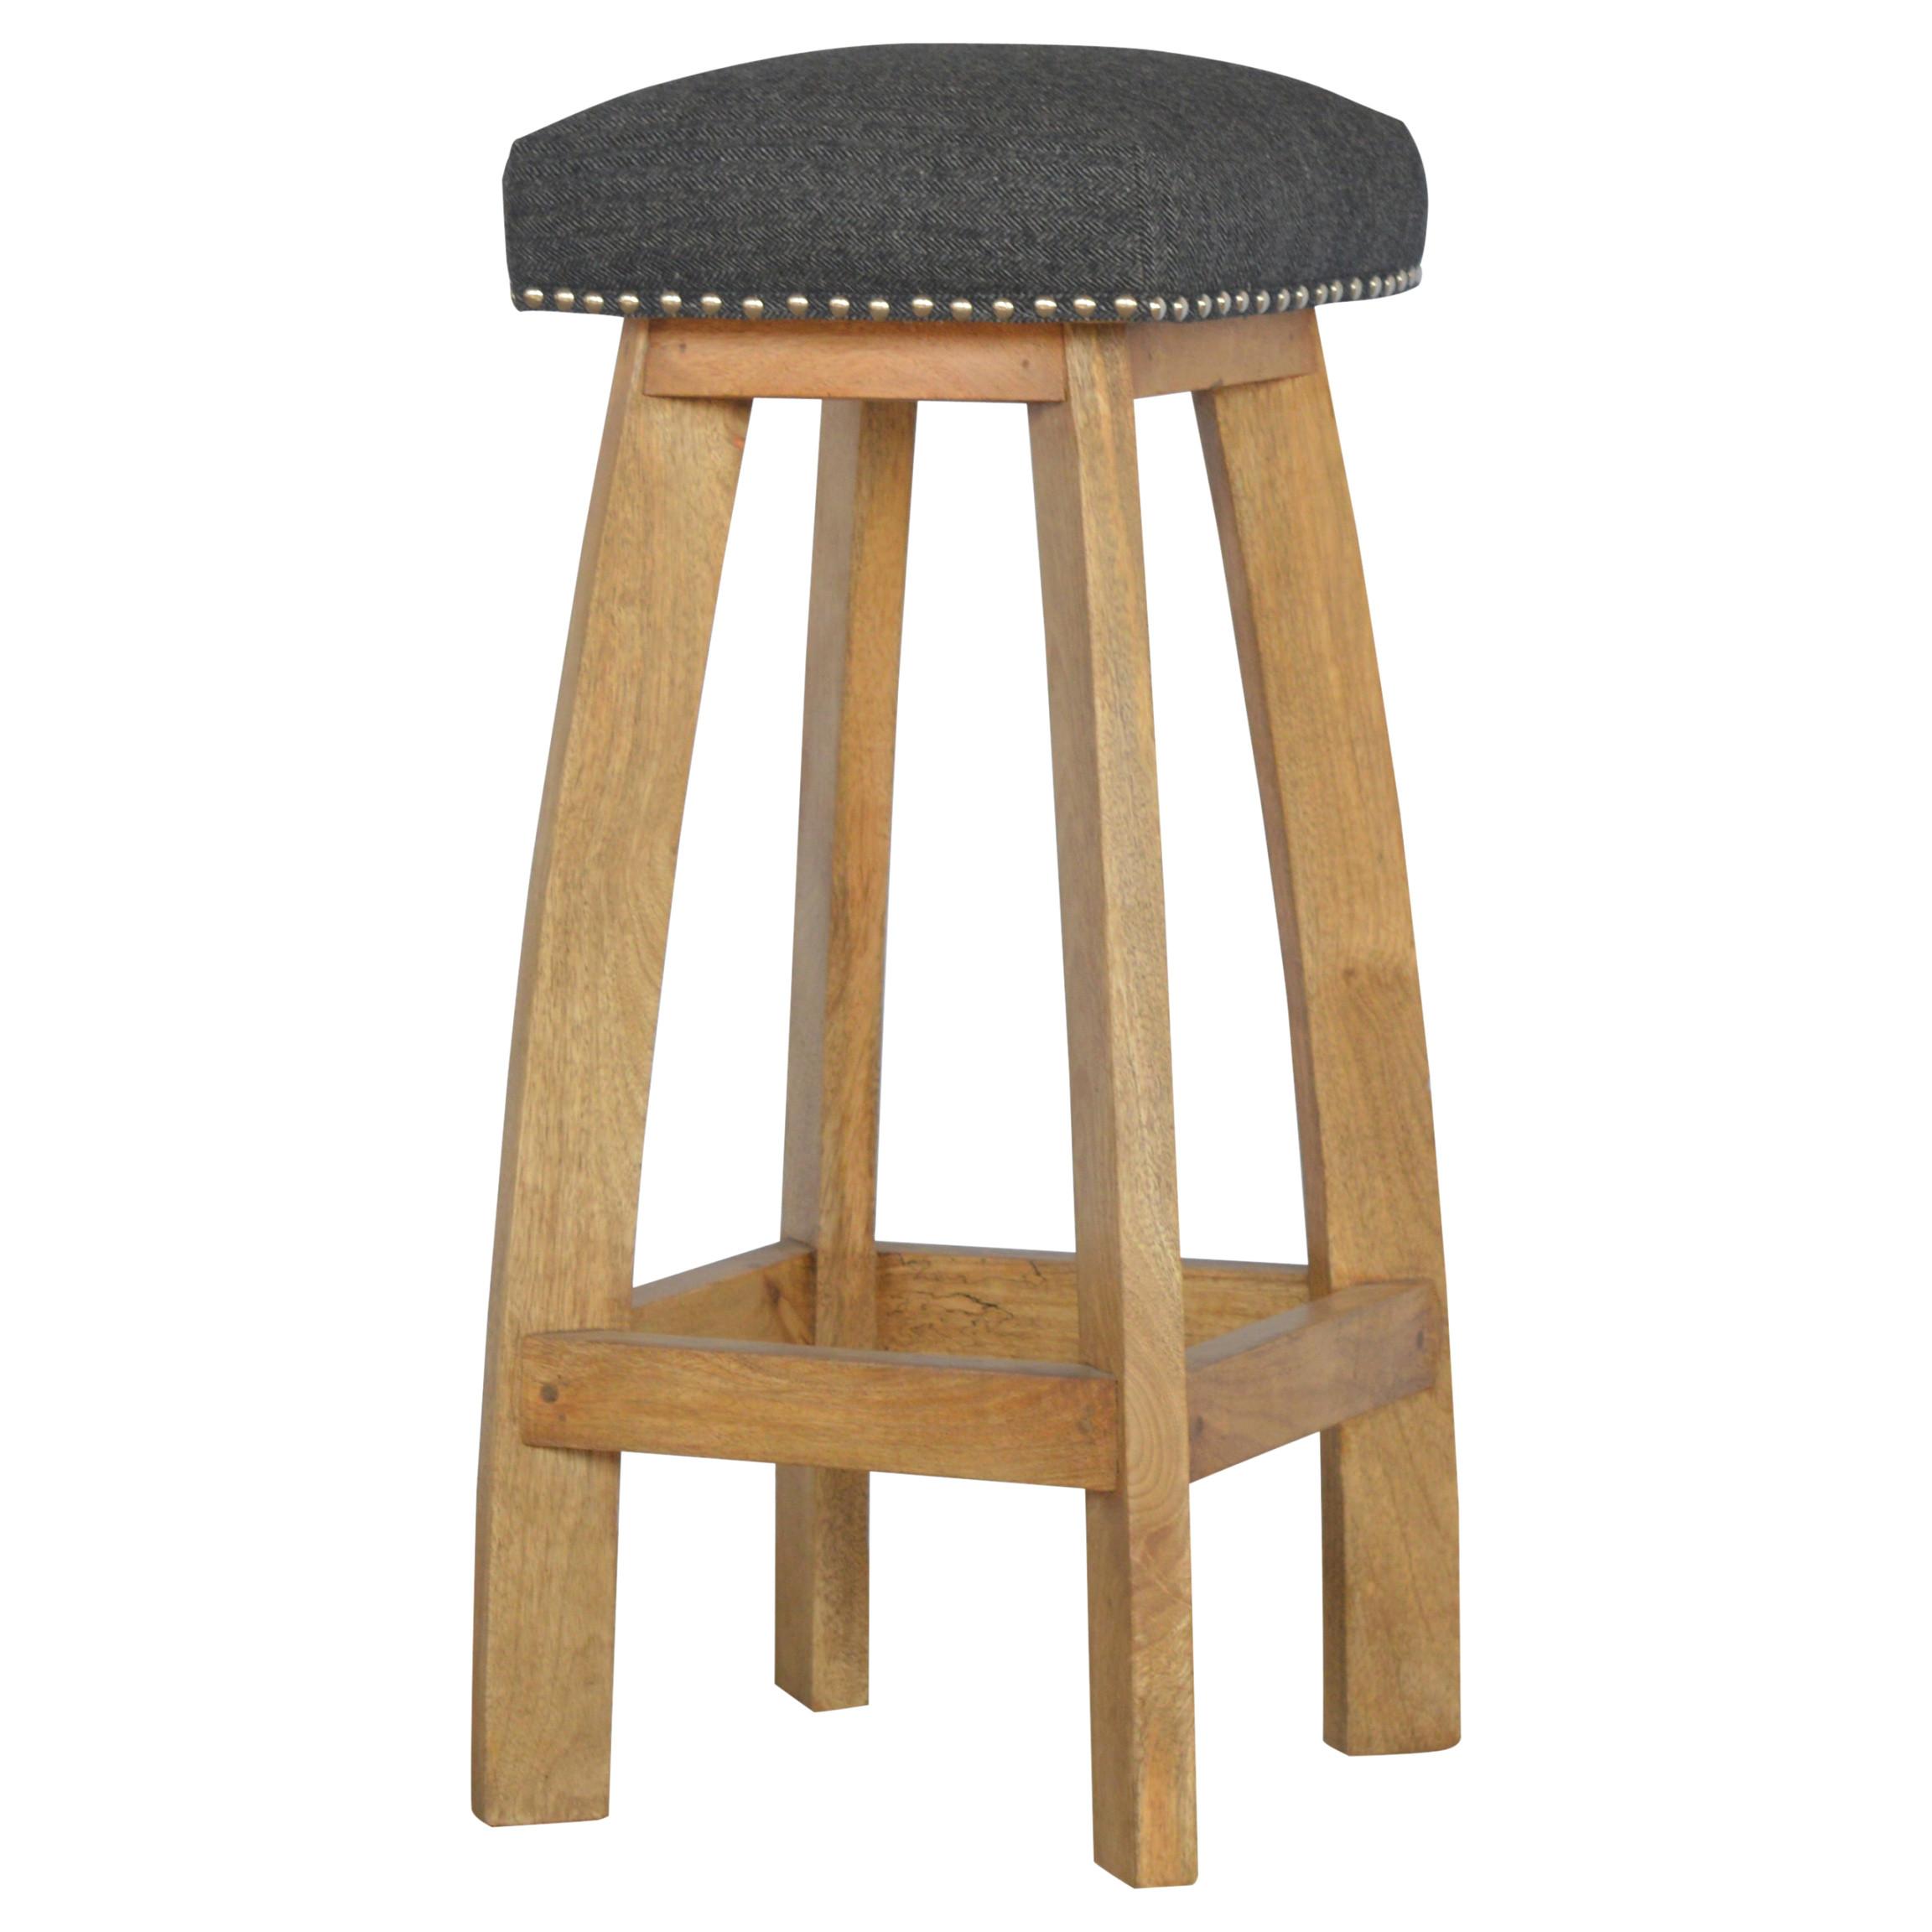 Replacement Seats for Swivel Bar Stools Uk 13 solid Wood Swivel Bar Stools Pics My Interior S Life